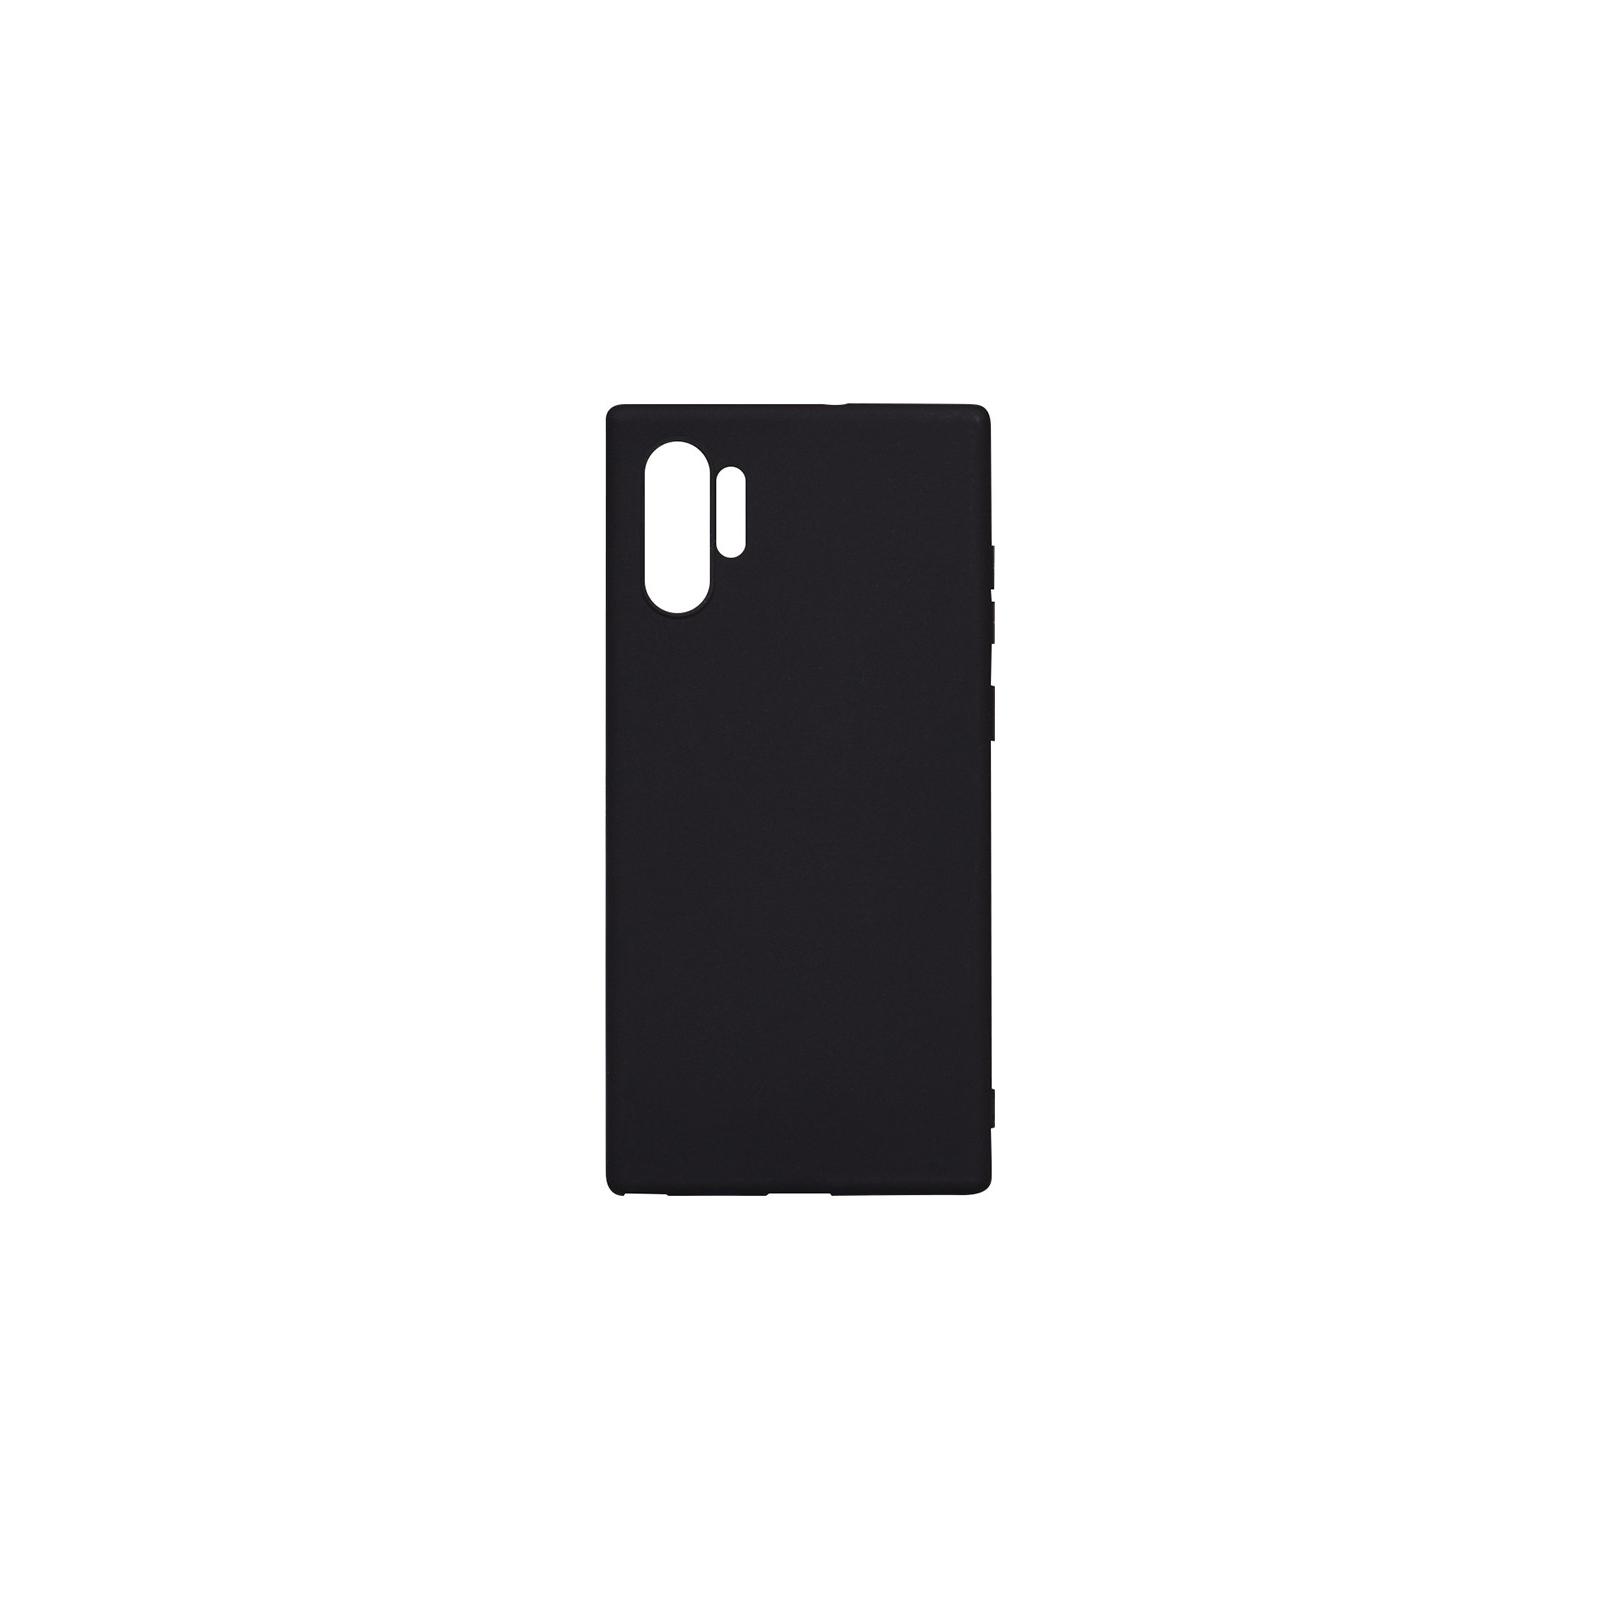 Чехол для моб. телефона Toto 1mm Matt TPU Case Samsung Galaxy Note 10+ Black (F_101601)